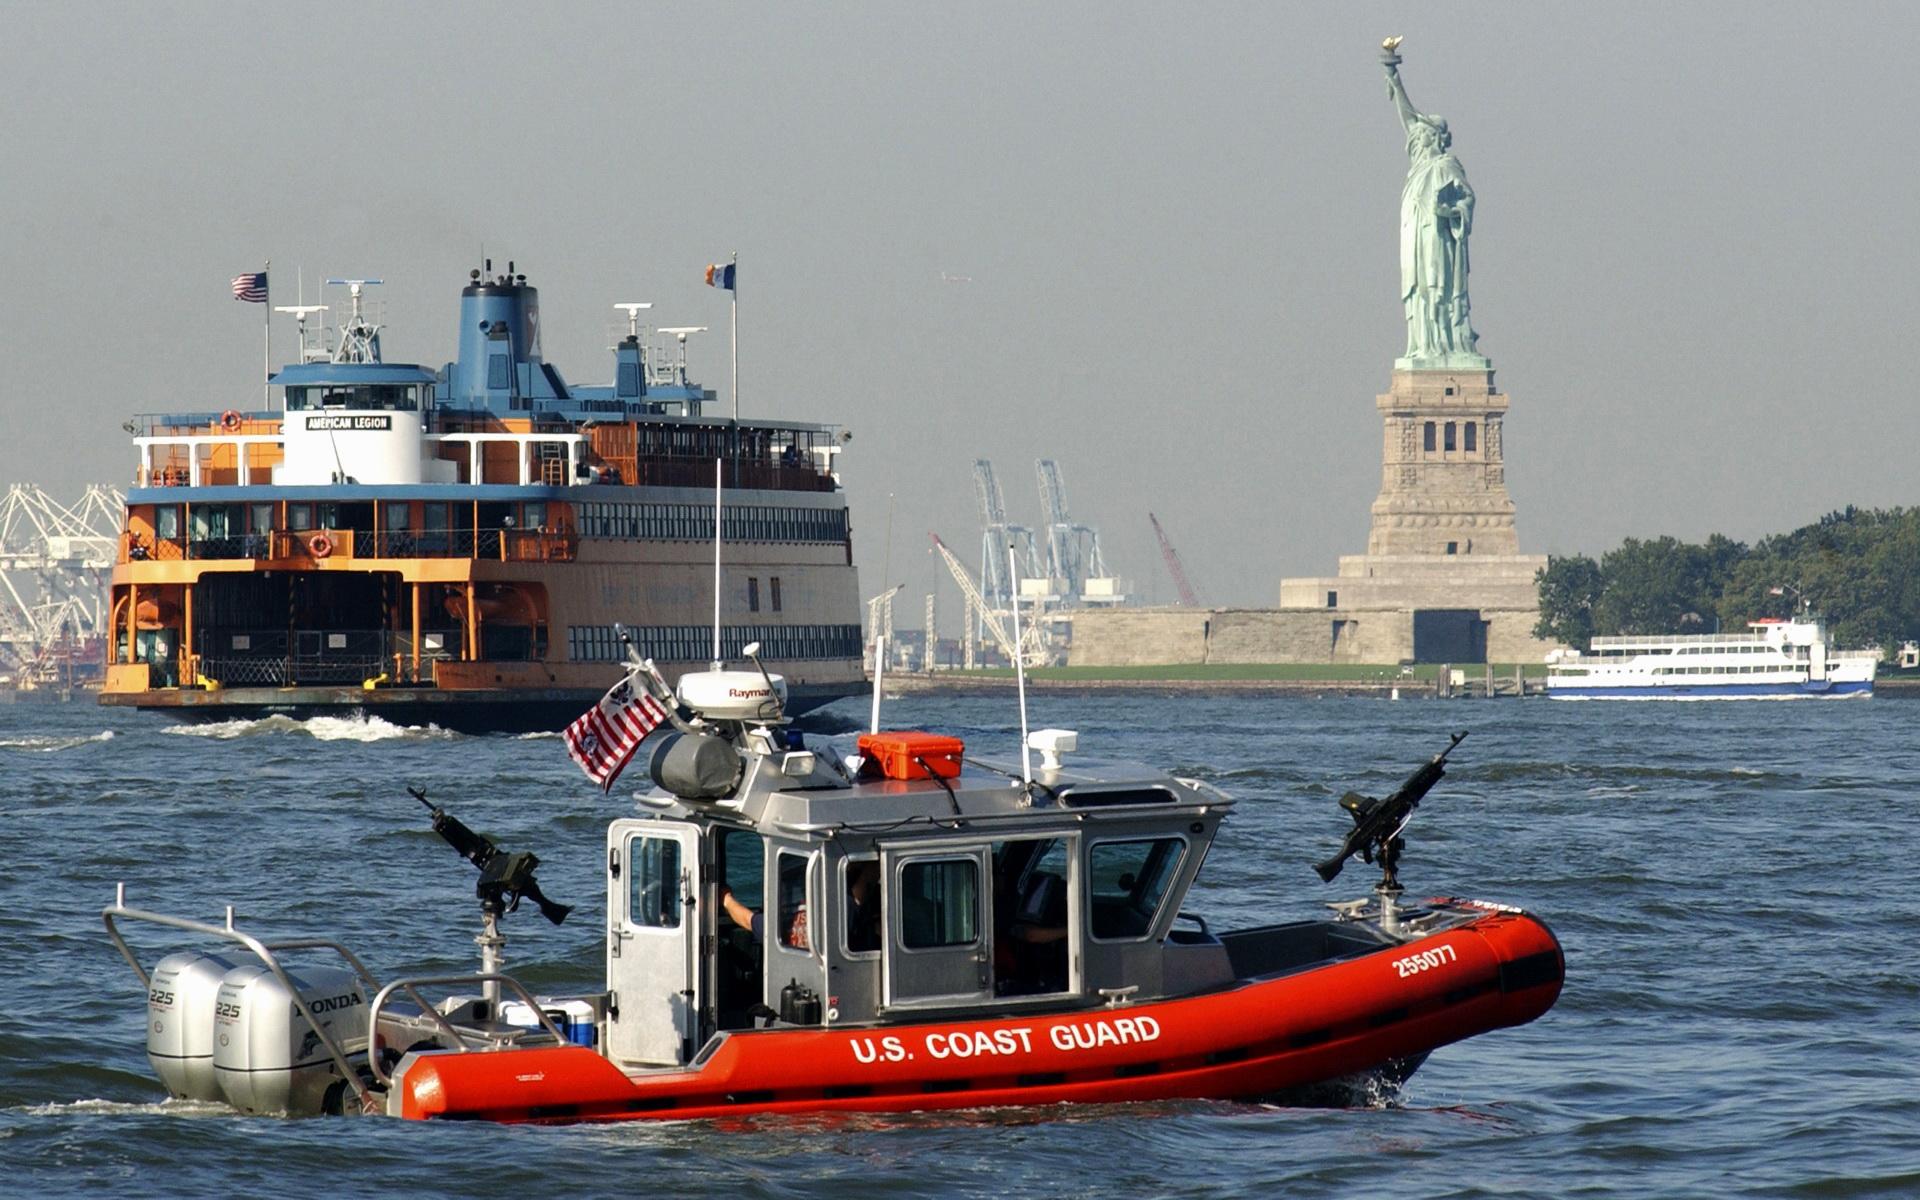 Ships u.s. coast guard Wallpapers and photos